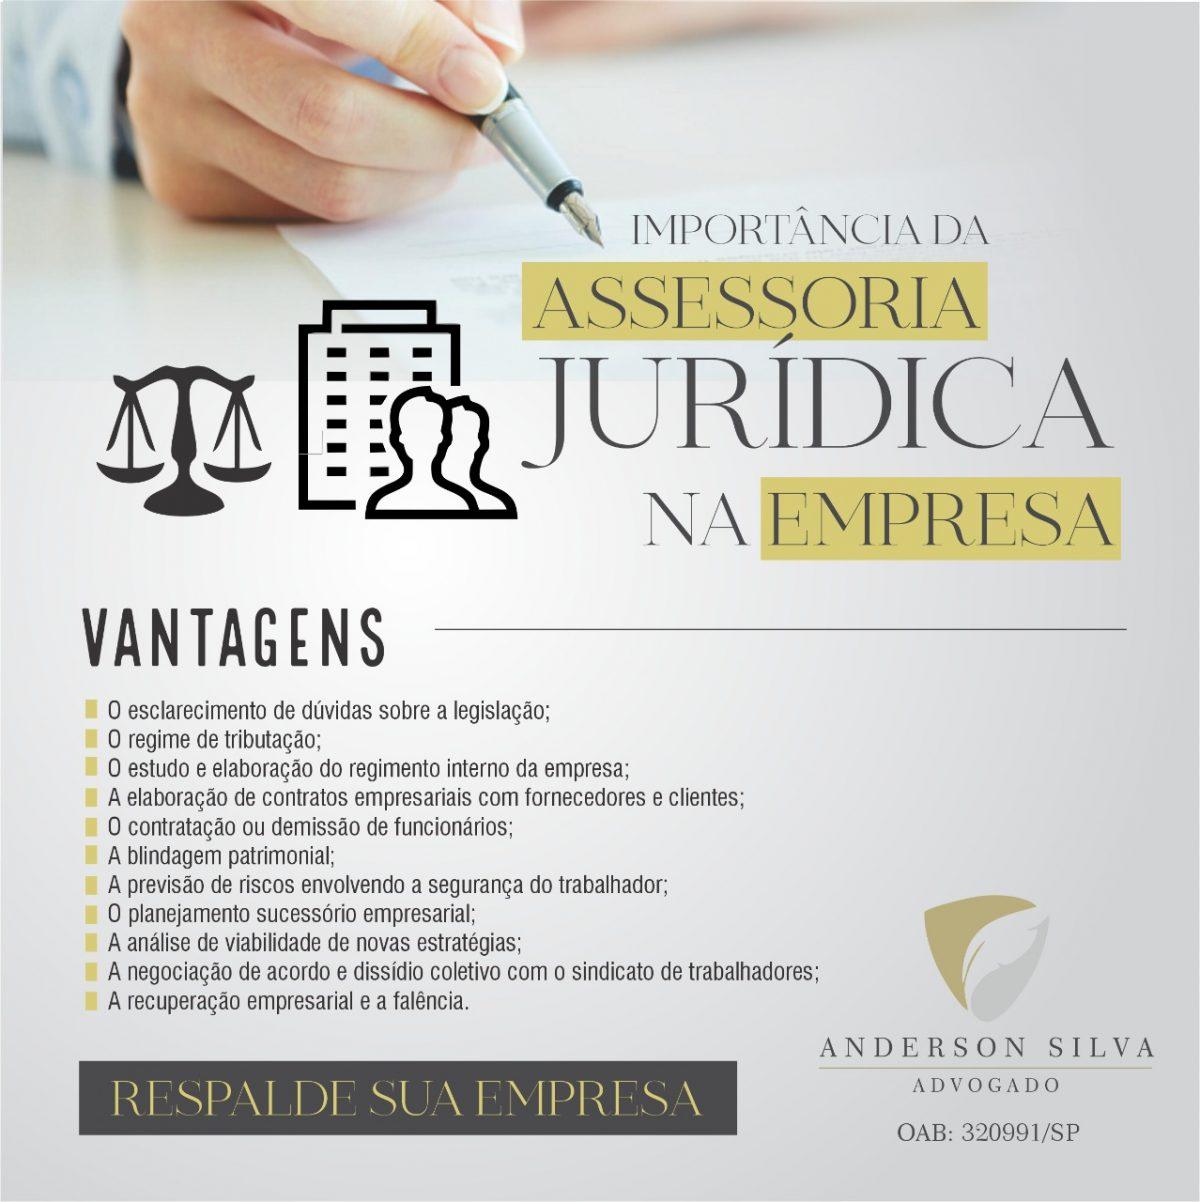 Importância da Assessoria Jurídica na Empresa